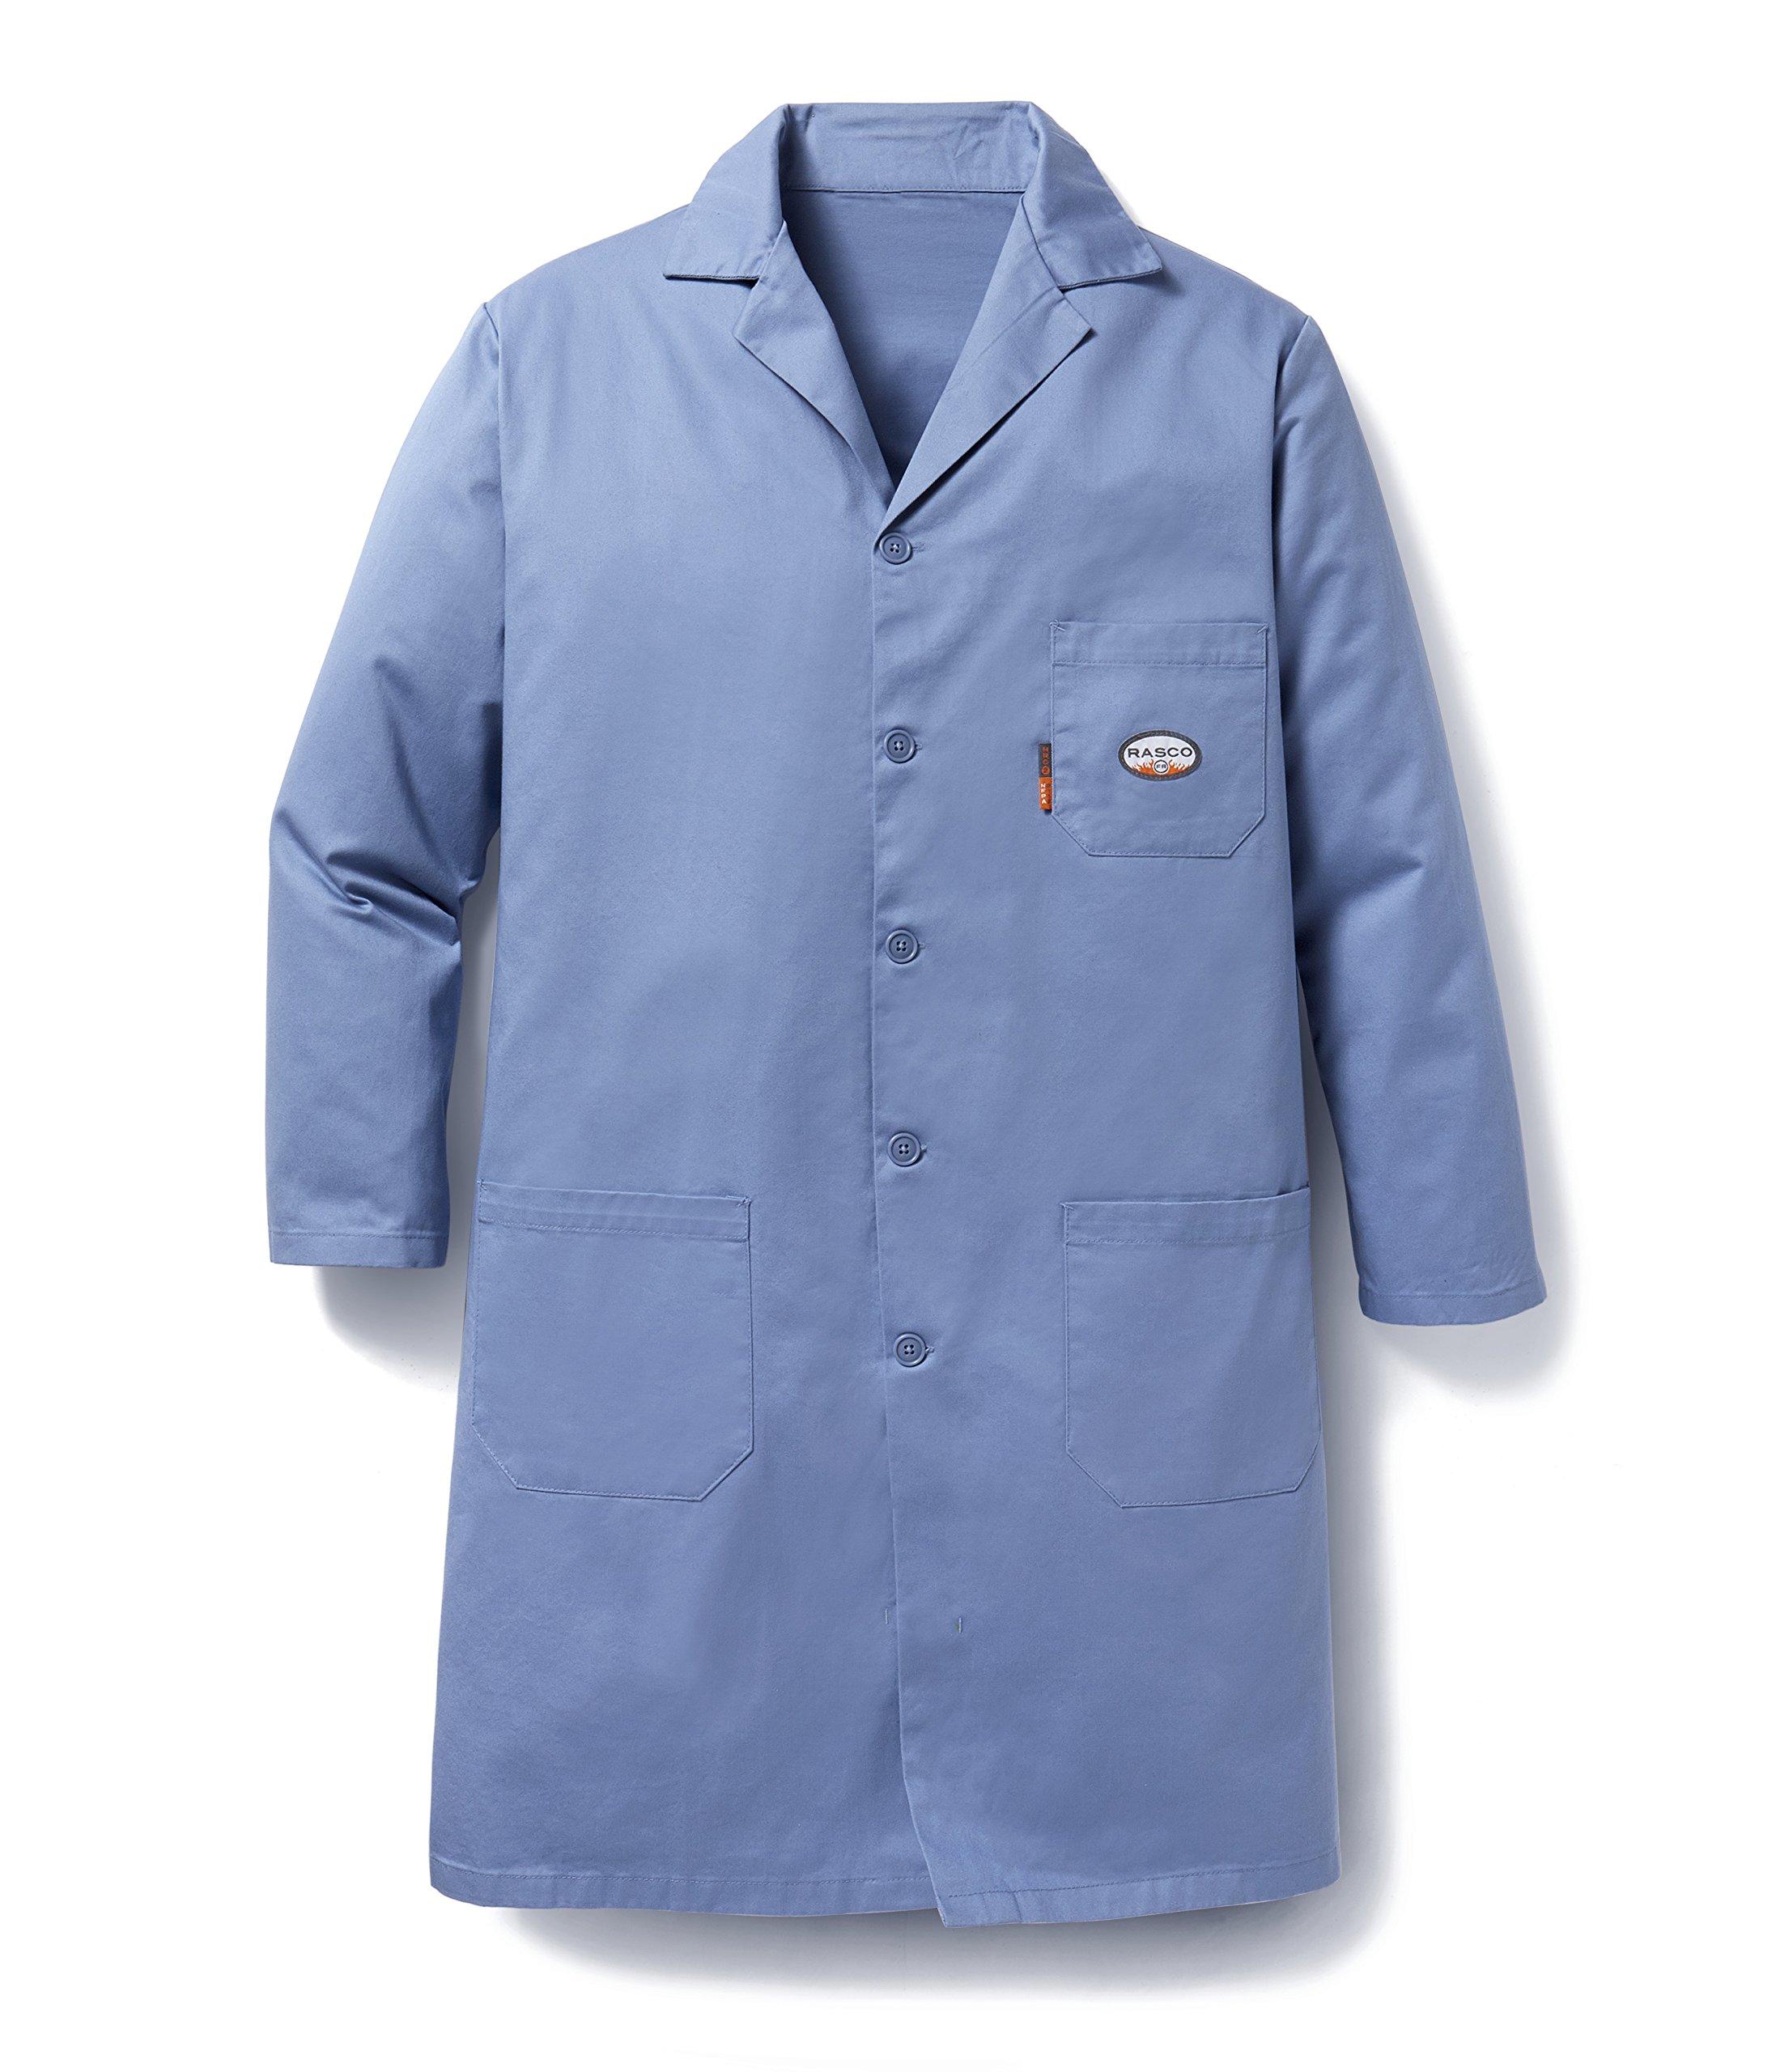 Rasco FR Lab Coat (X-Large) by Rasco FR (Image #1)